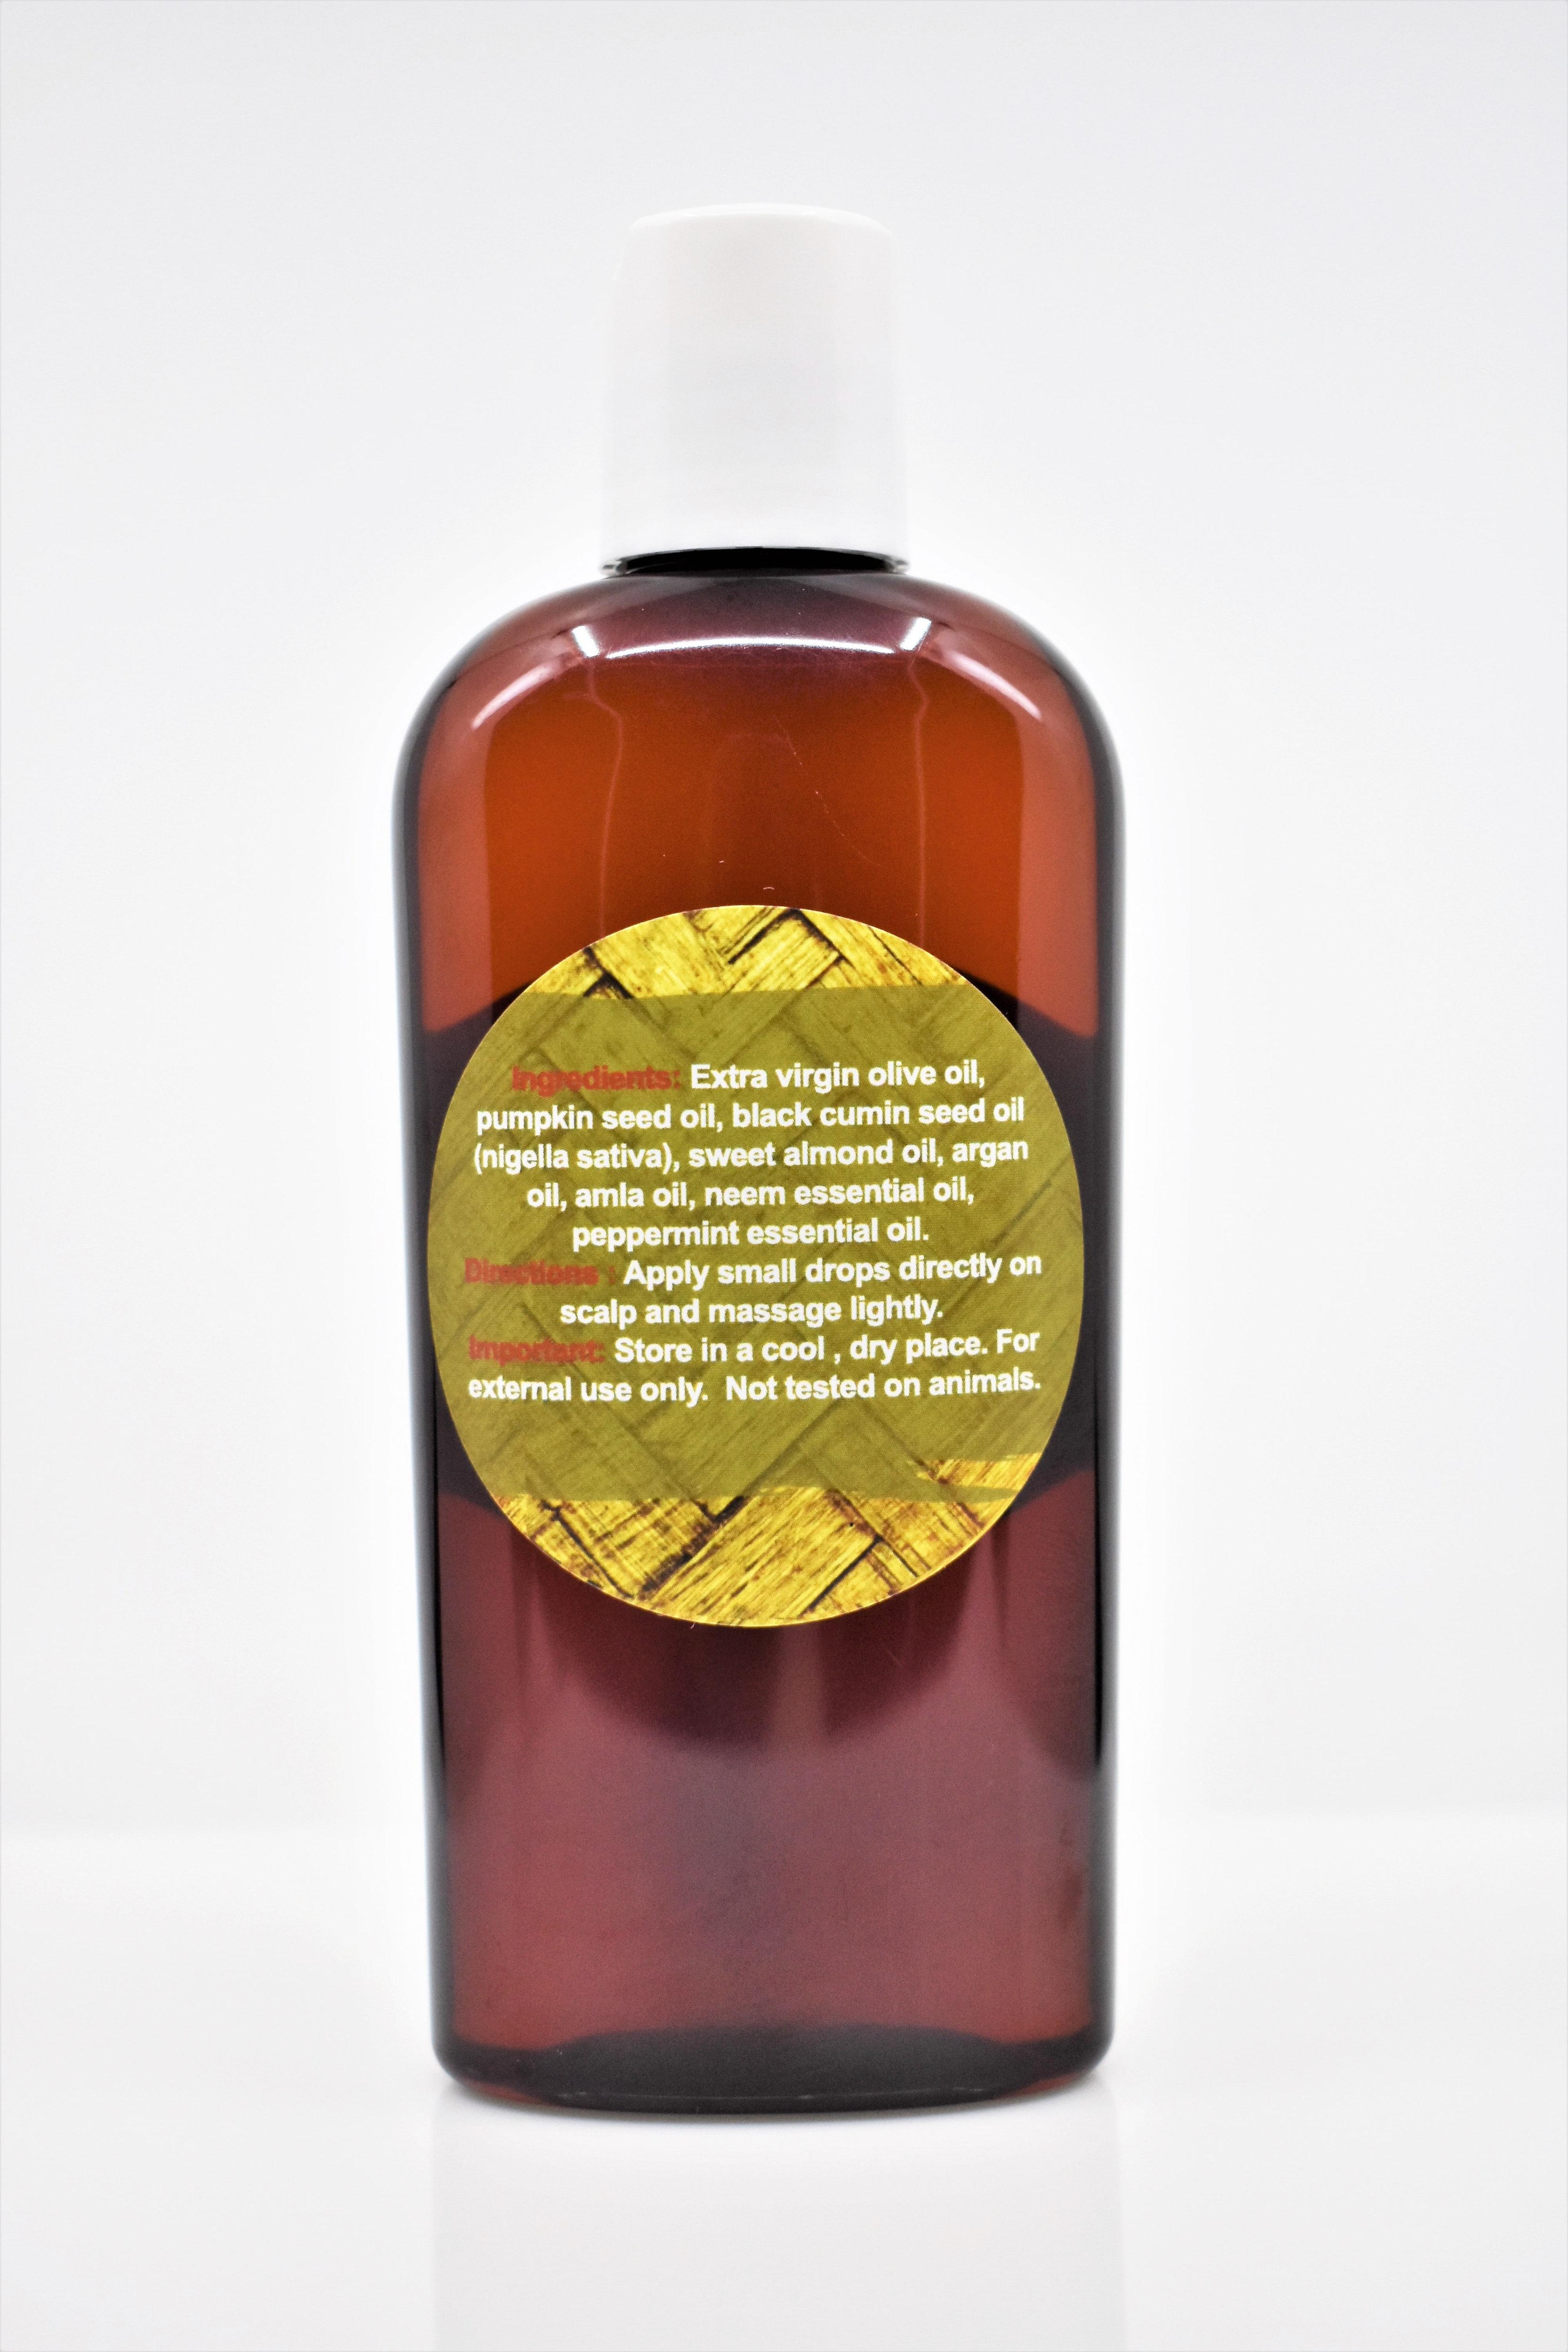 Mel S Scalp Stimulation Oil Hair Growth Essential Oil Blend 4oz Melsbutterblends